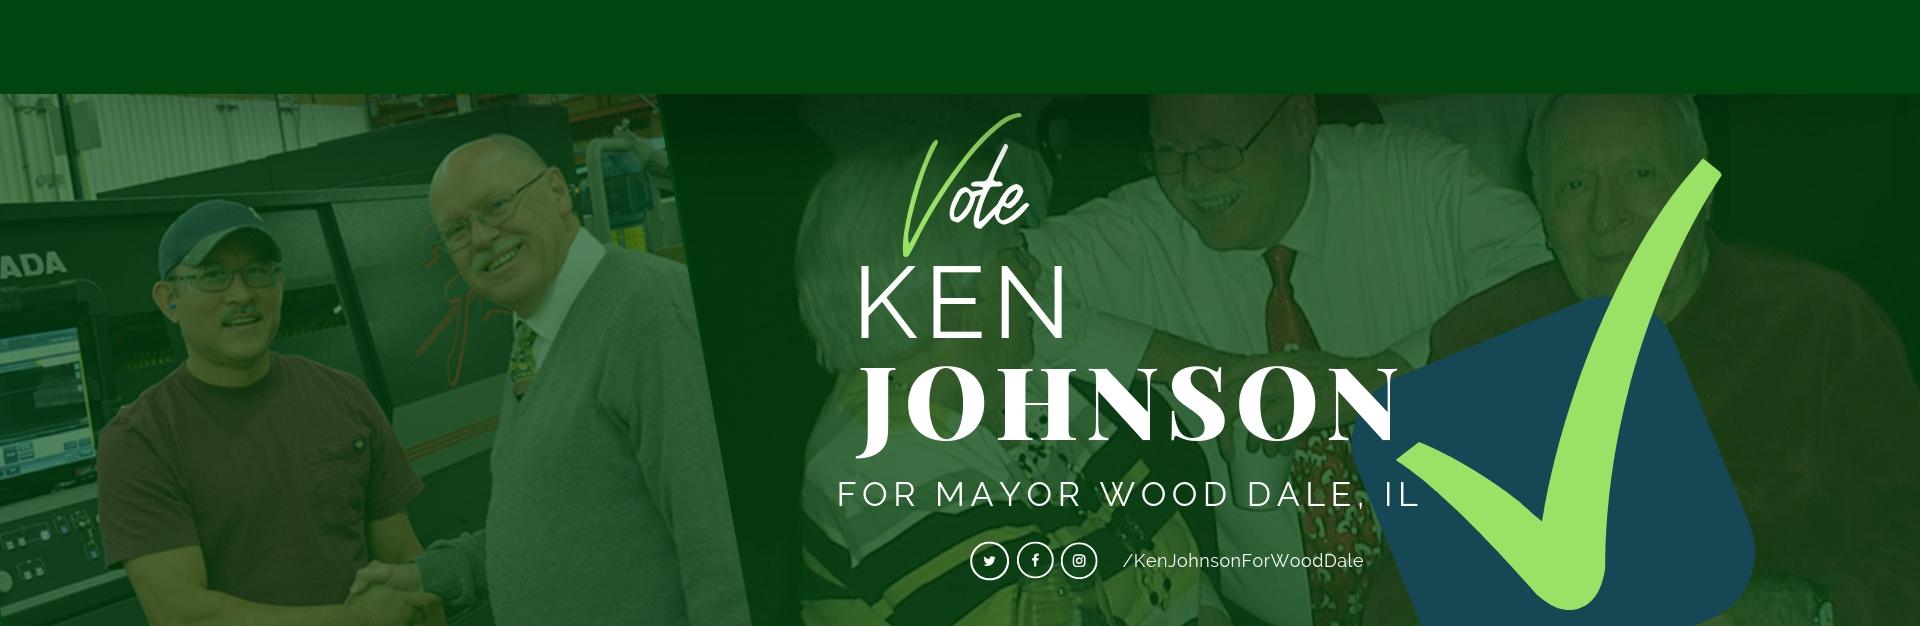 Kenneth-P-Johnson-for-Mayor-Wood-Dale-ILLINOIS.jpg